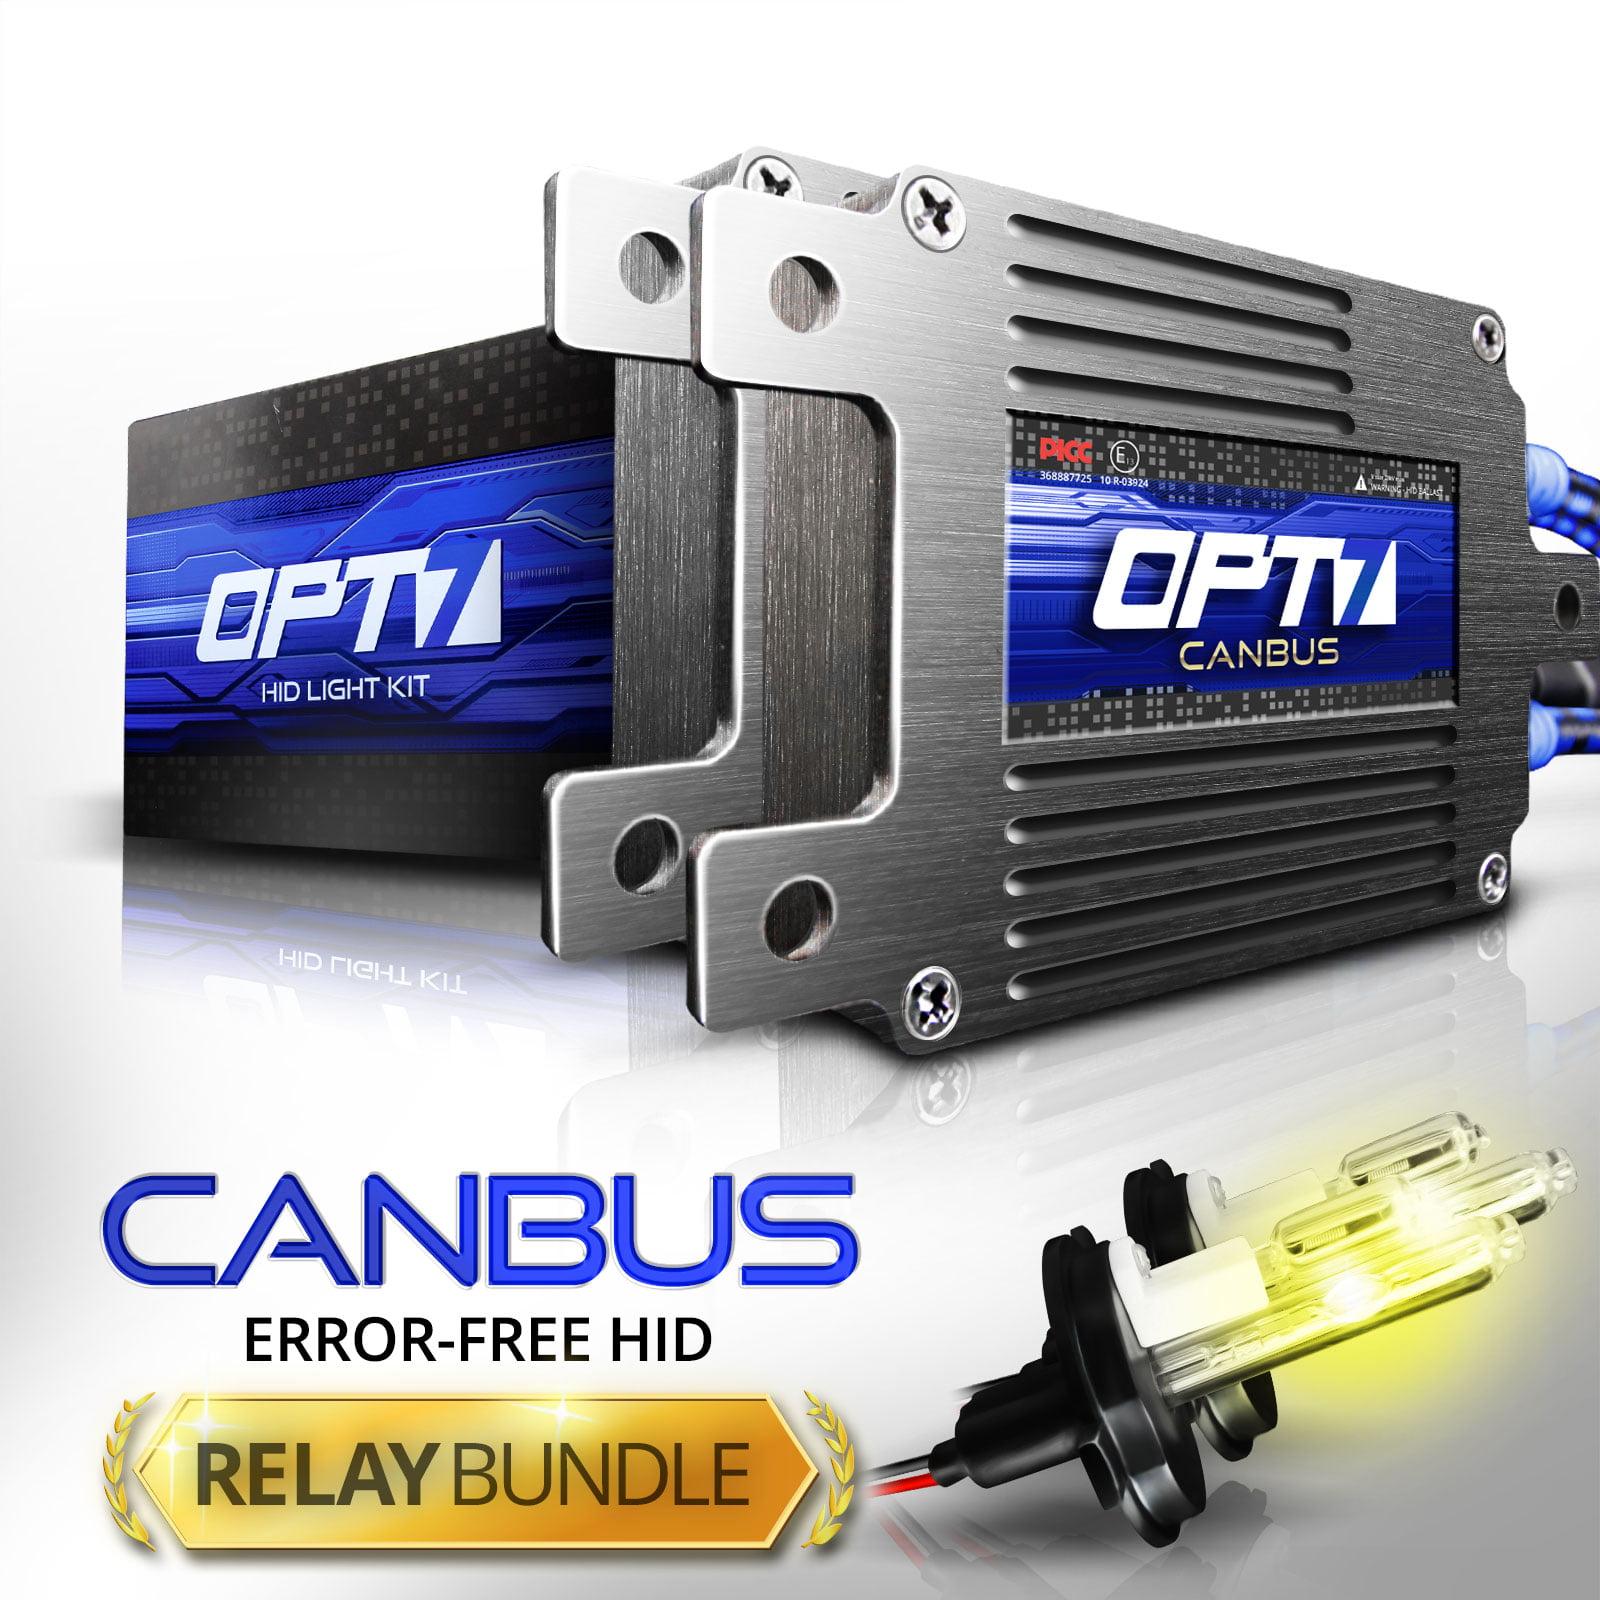 Boltzen AC 55w CanBUS HID Kit w/ Relay & Capacitors Bundle H11 [6000K Lightning Blue] 2 Yr Warranty